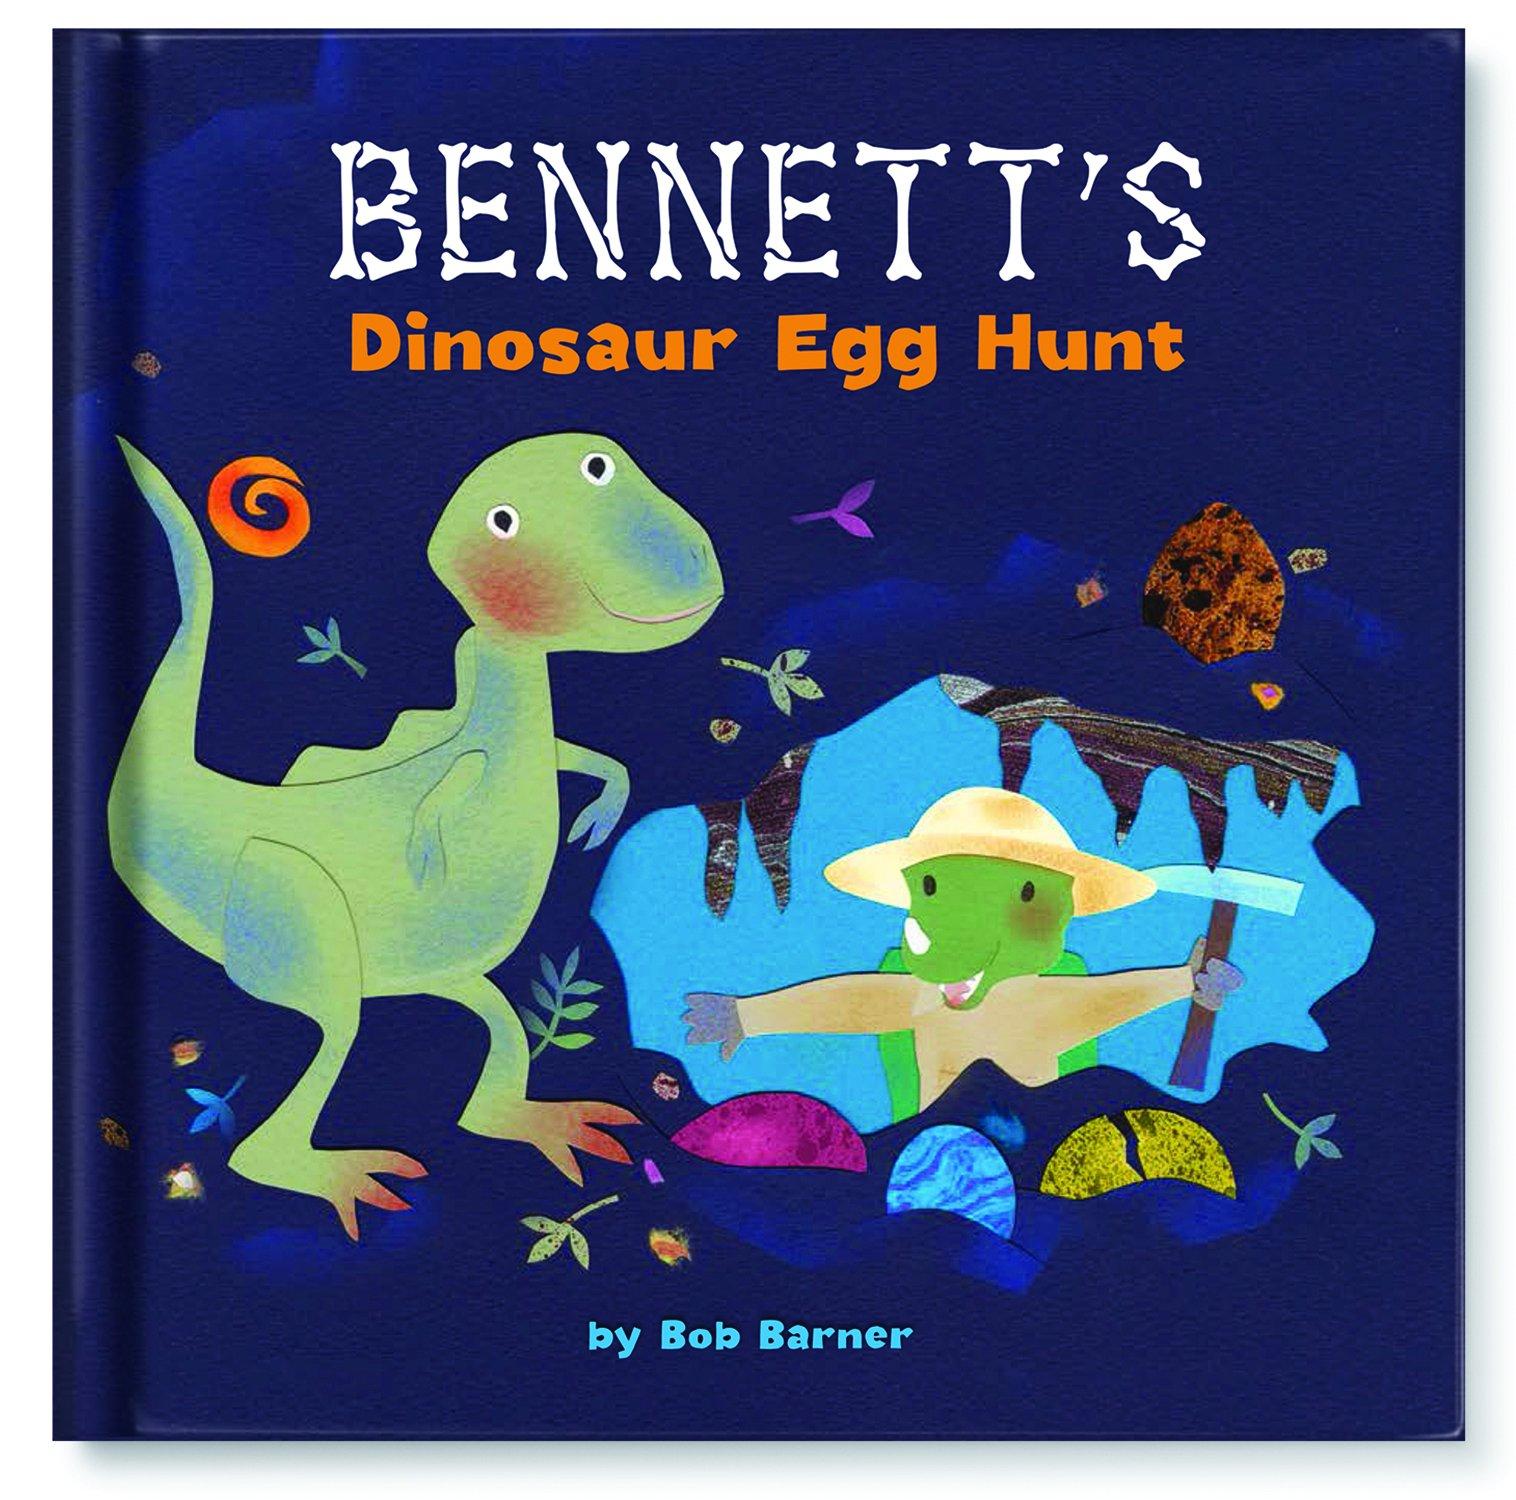 Dinosaur Exploration Personalized Custom Name Book for Kids Children Boys Girls: Dino Fun Educational